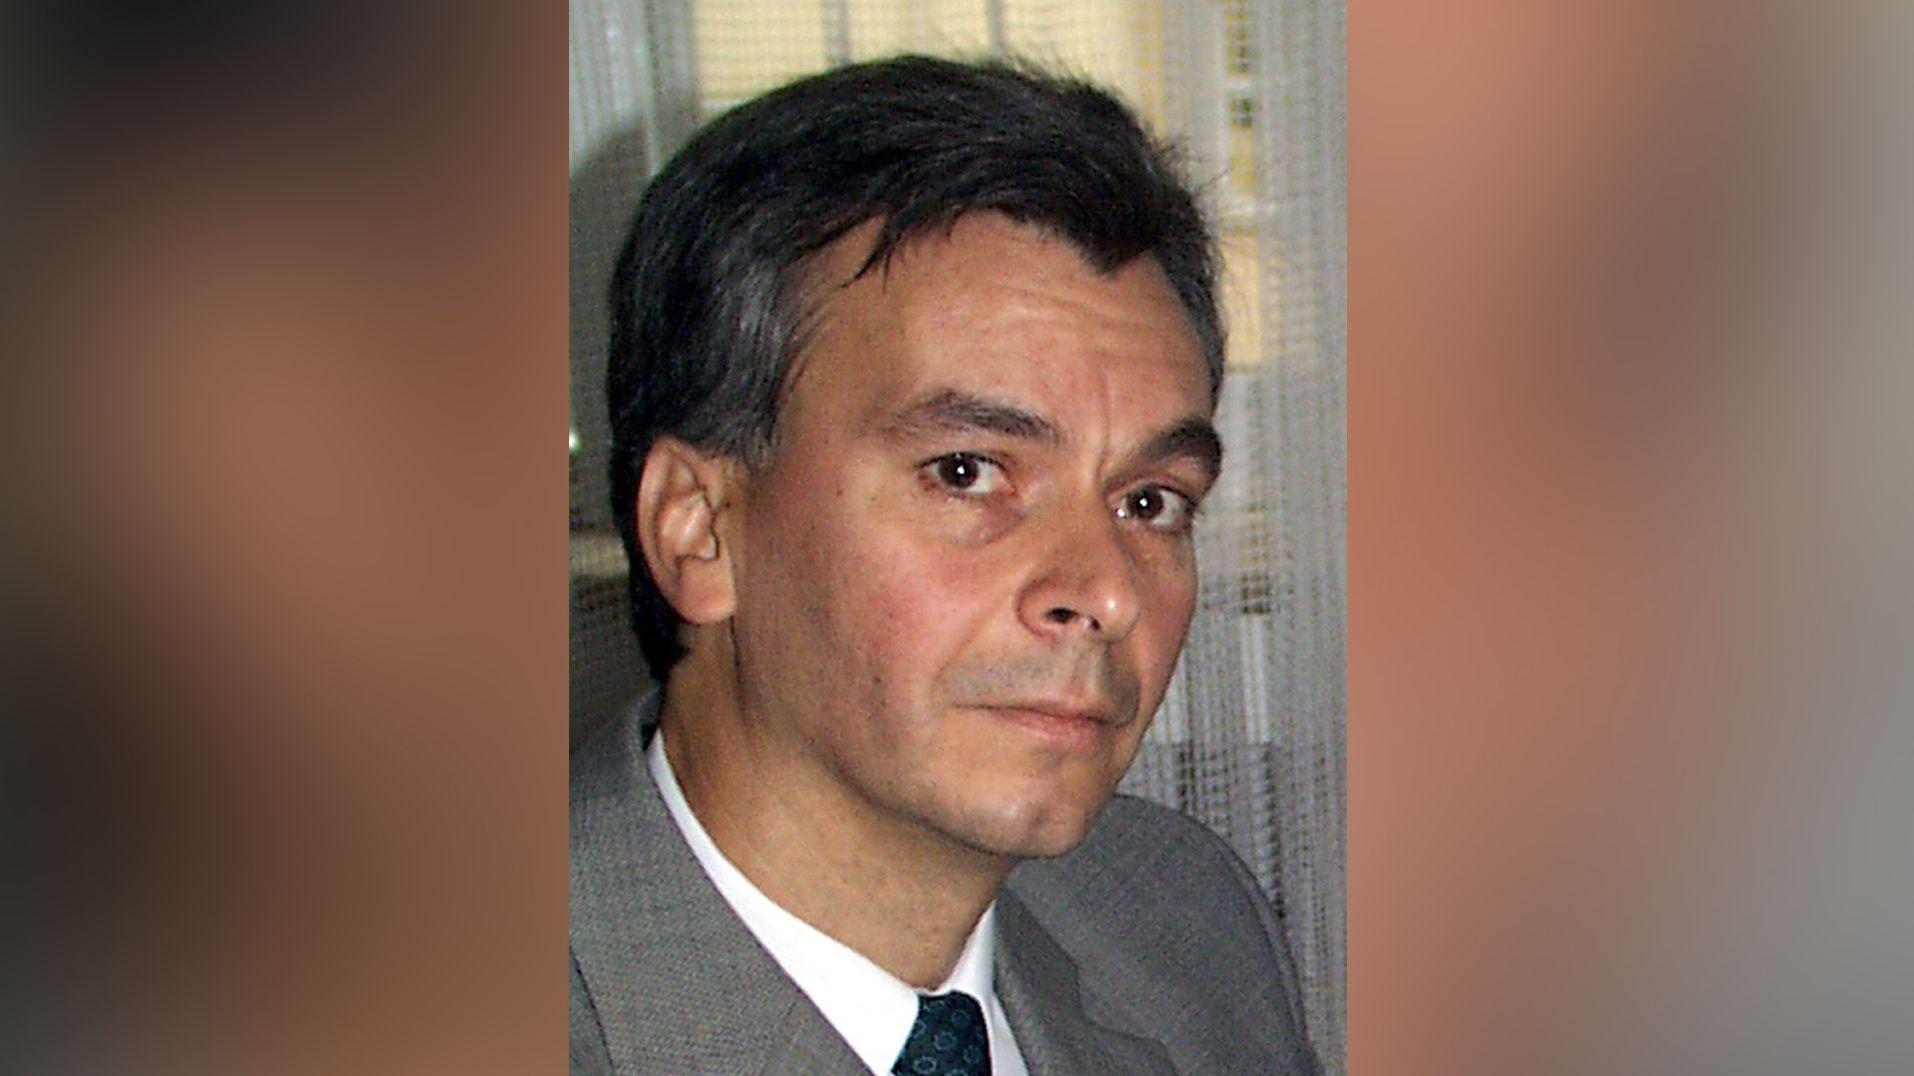 Der Würzburger Diözesanbaumeister Cesare Augusto Stefano